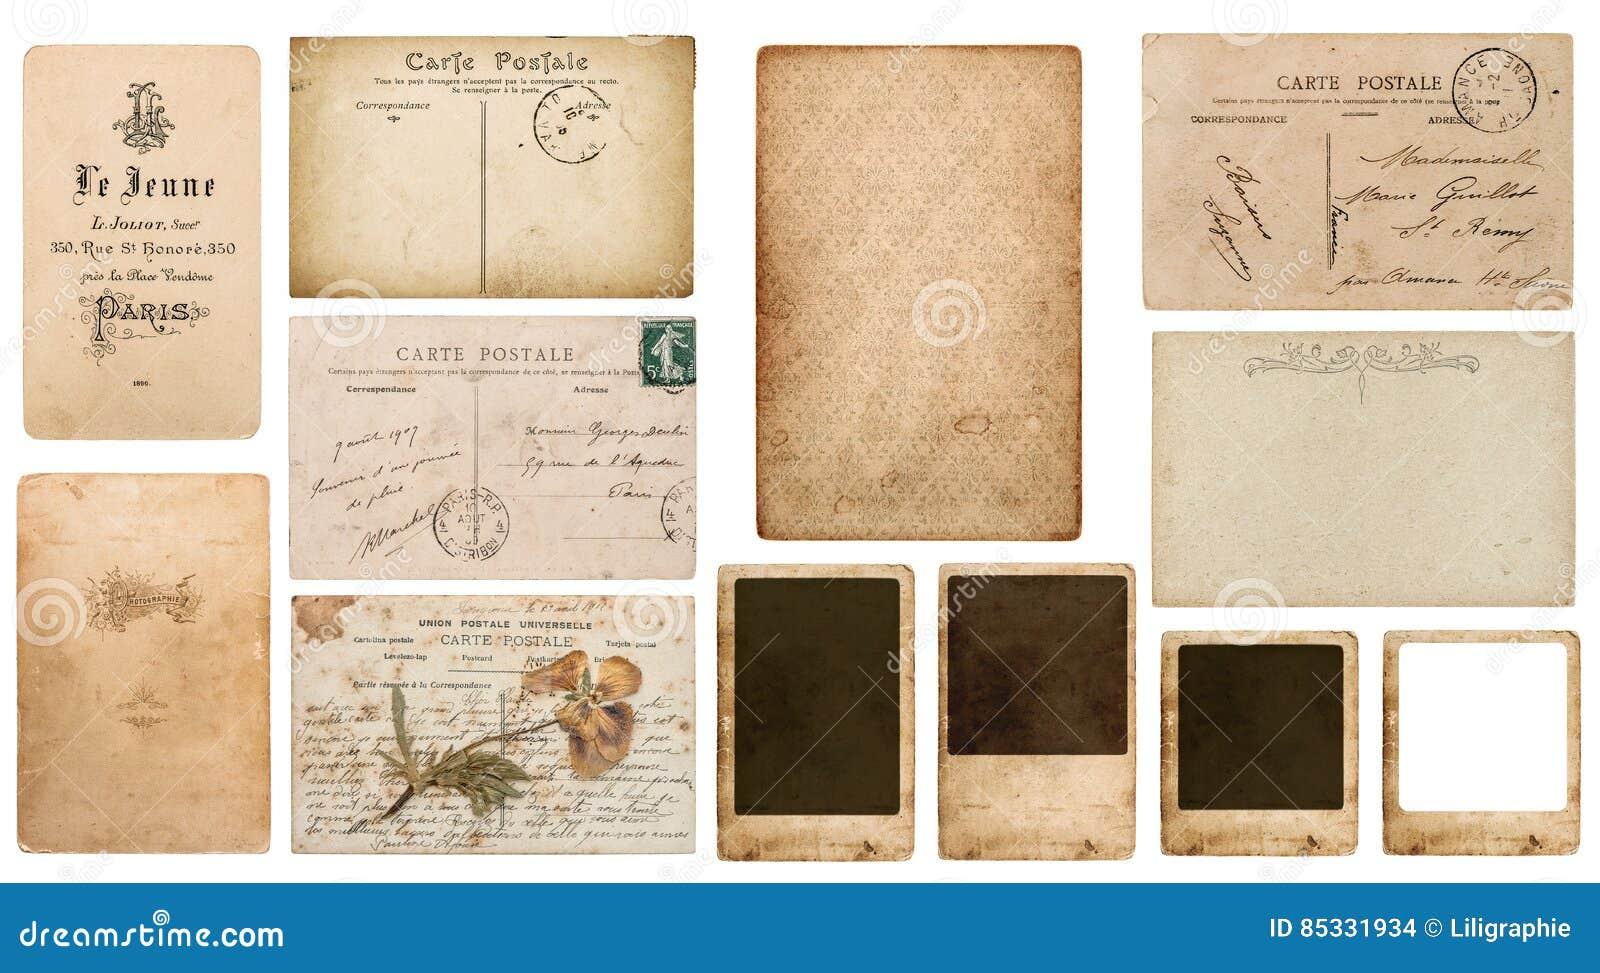 Postcard Carte Postale Photo Frame Cardboard Antique French De Visite Used Paper Pieces